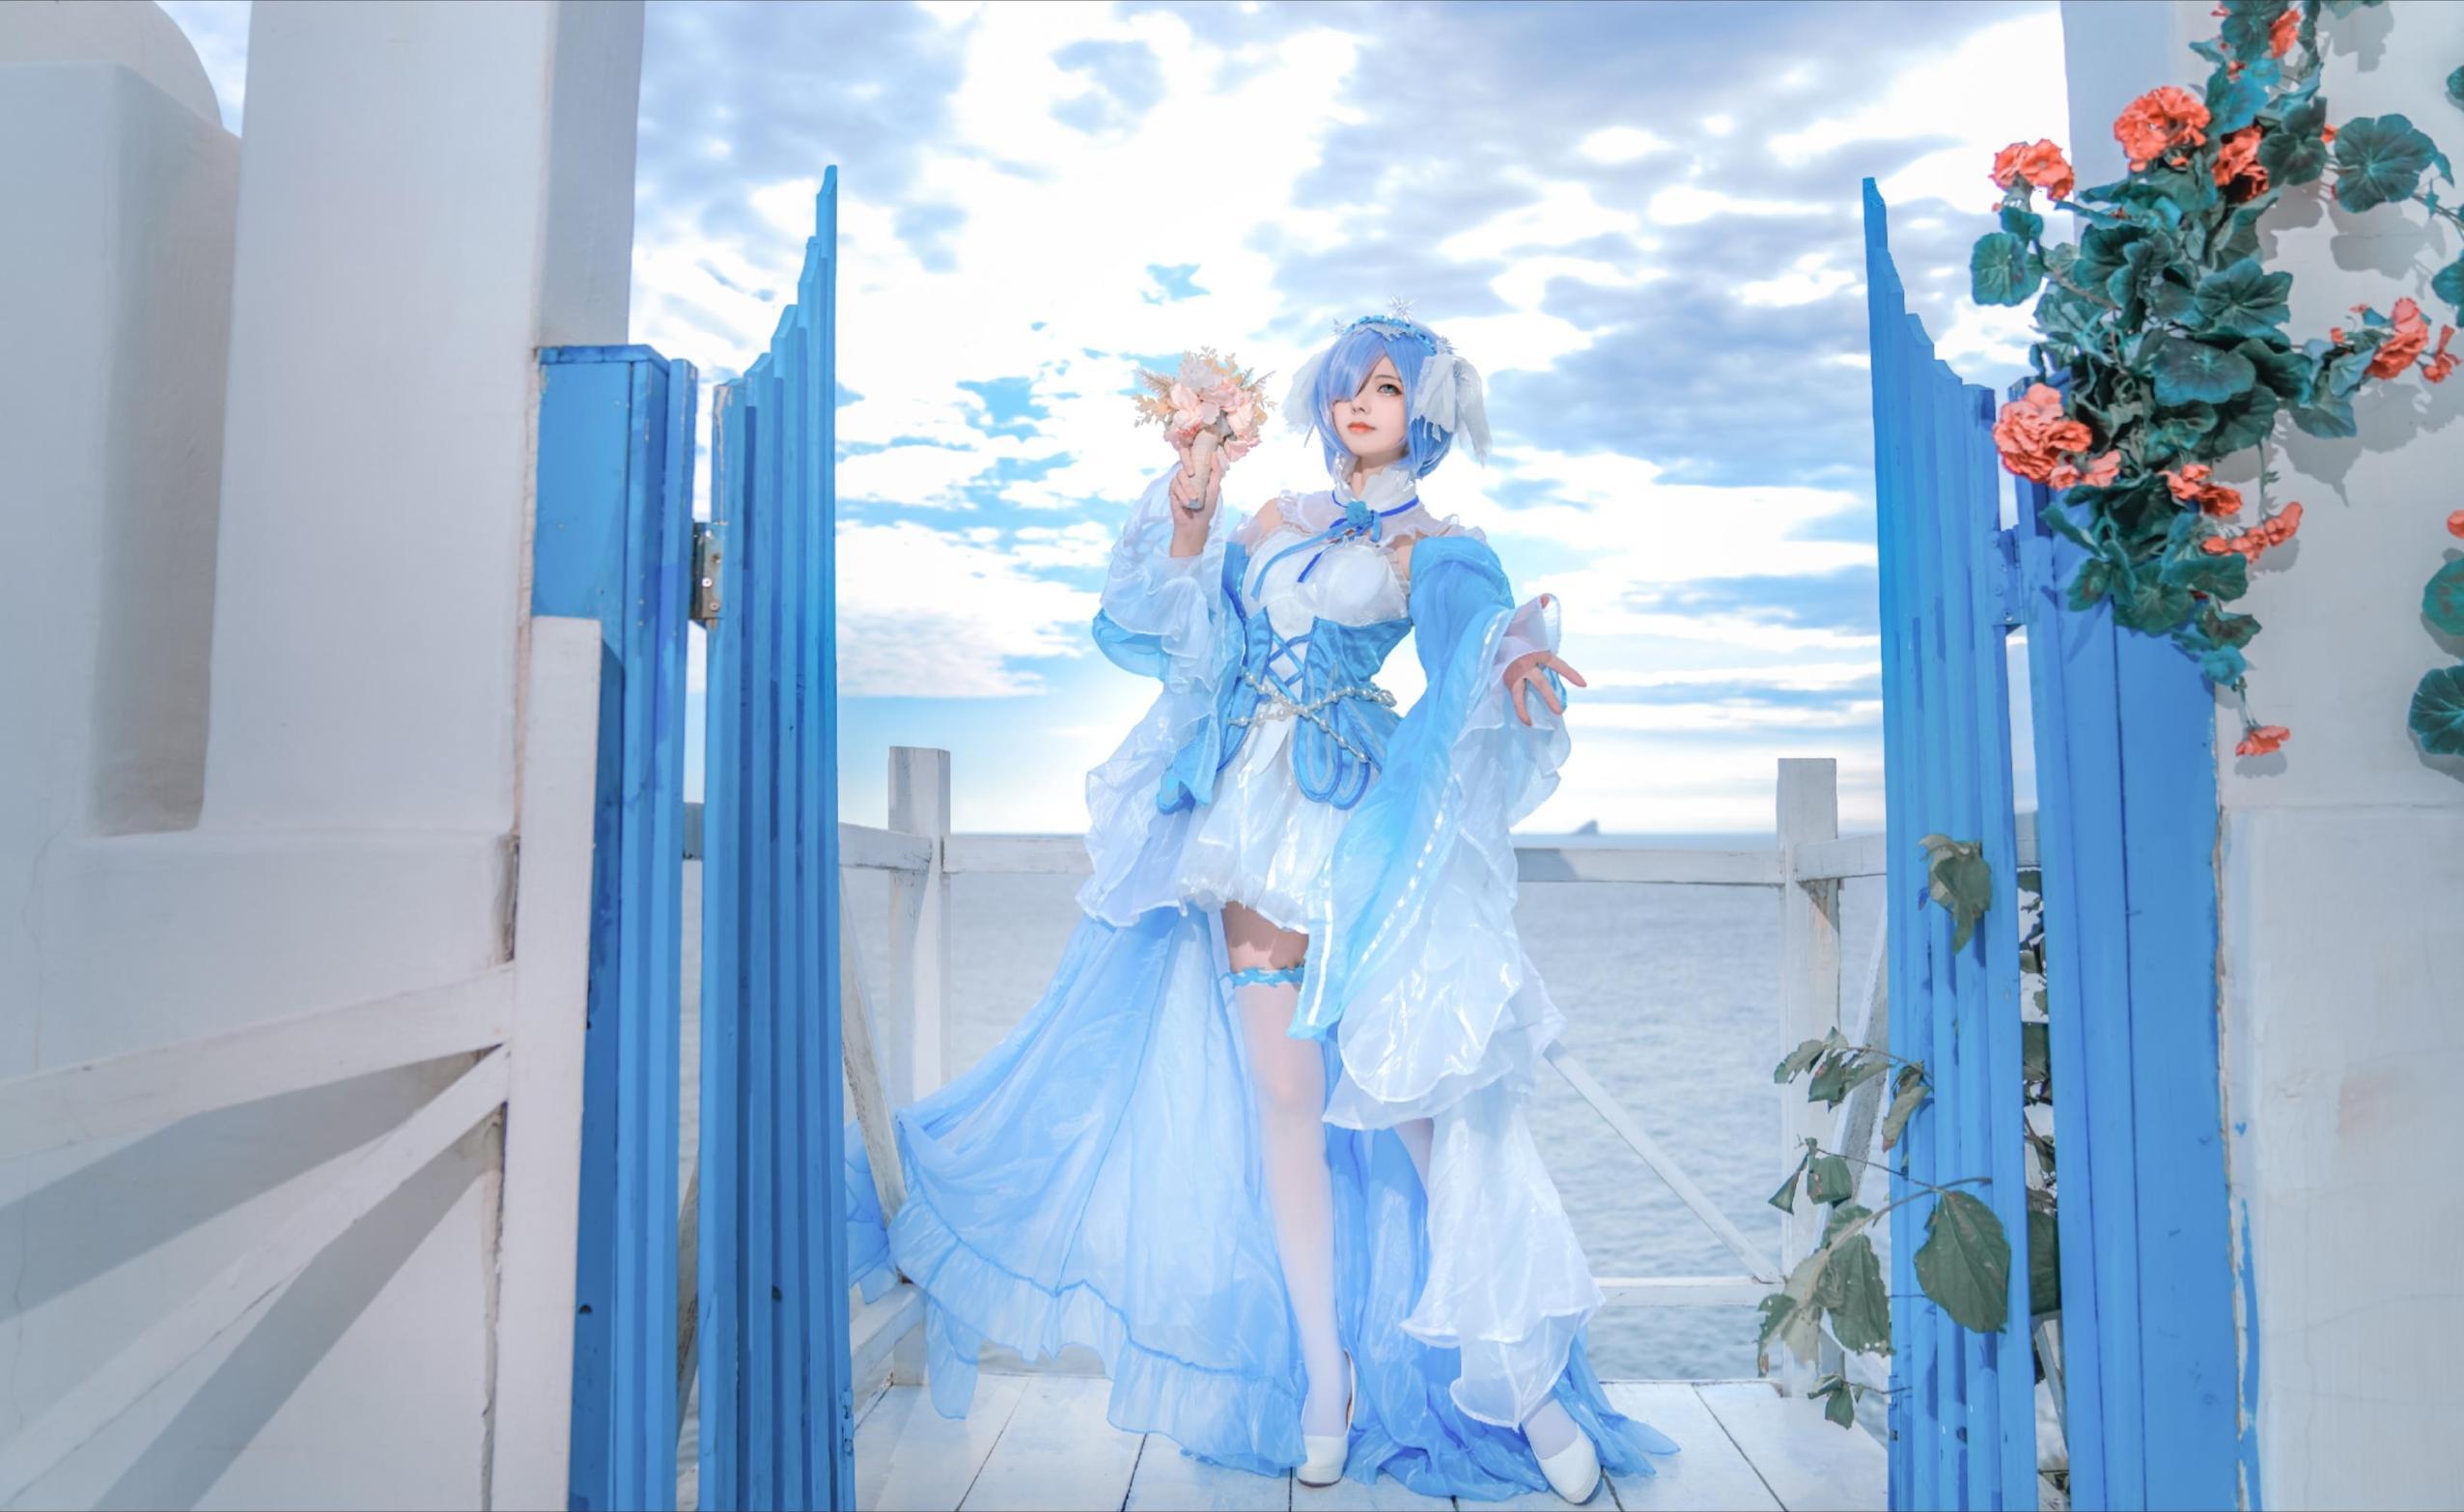 《RE:从零开始的异世界生活》蕾姆cosplay【CN:nino家的橘子】 -二次元cosplay美女图片插图